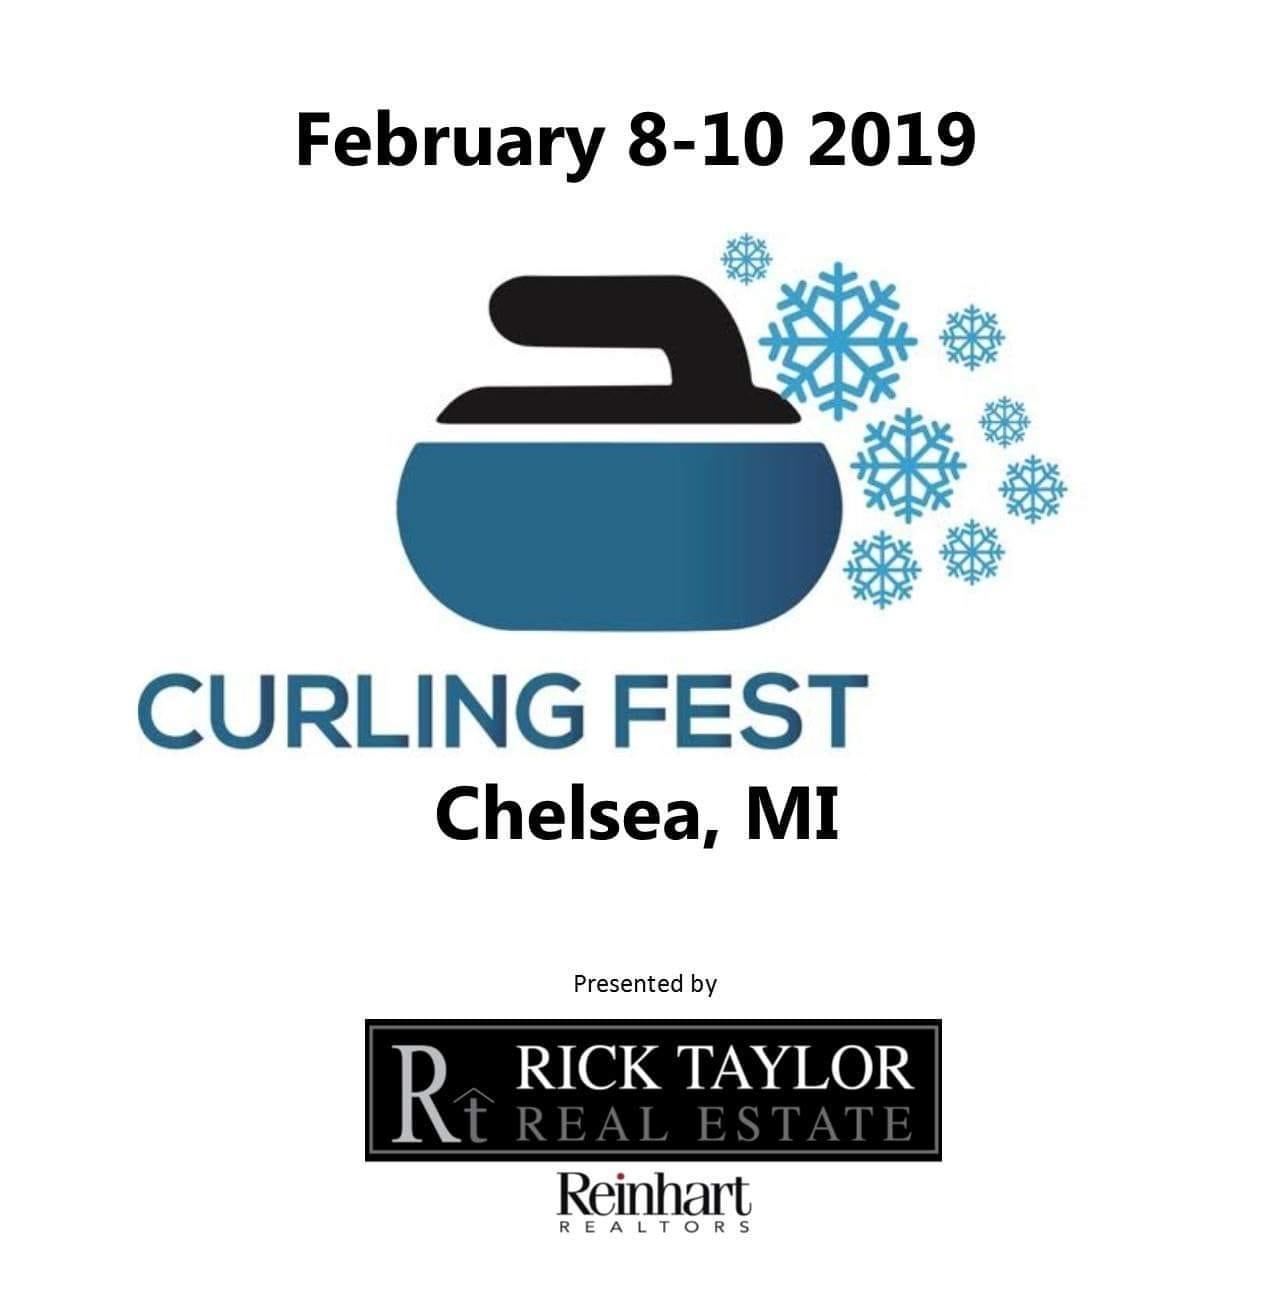 curling-fest-chelsea-mi.jpg